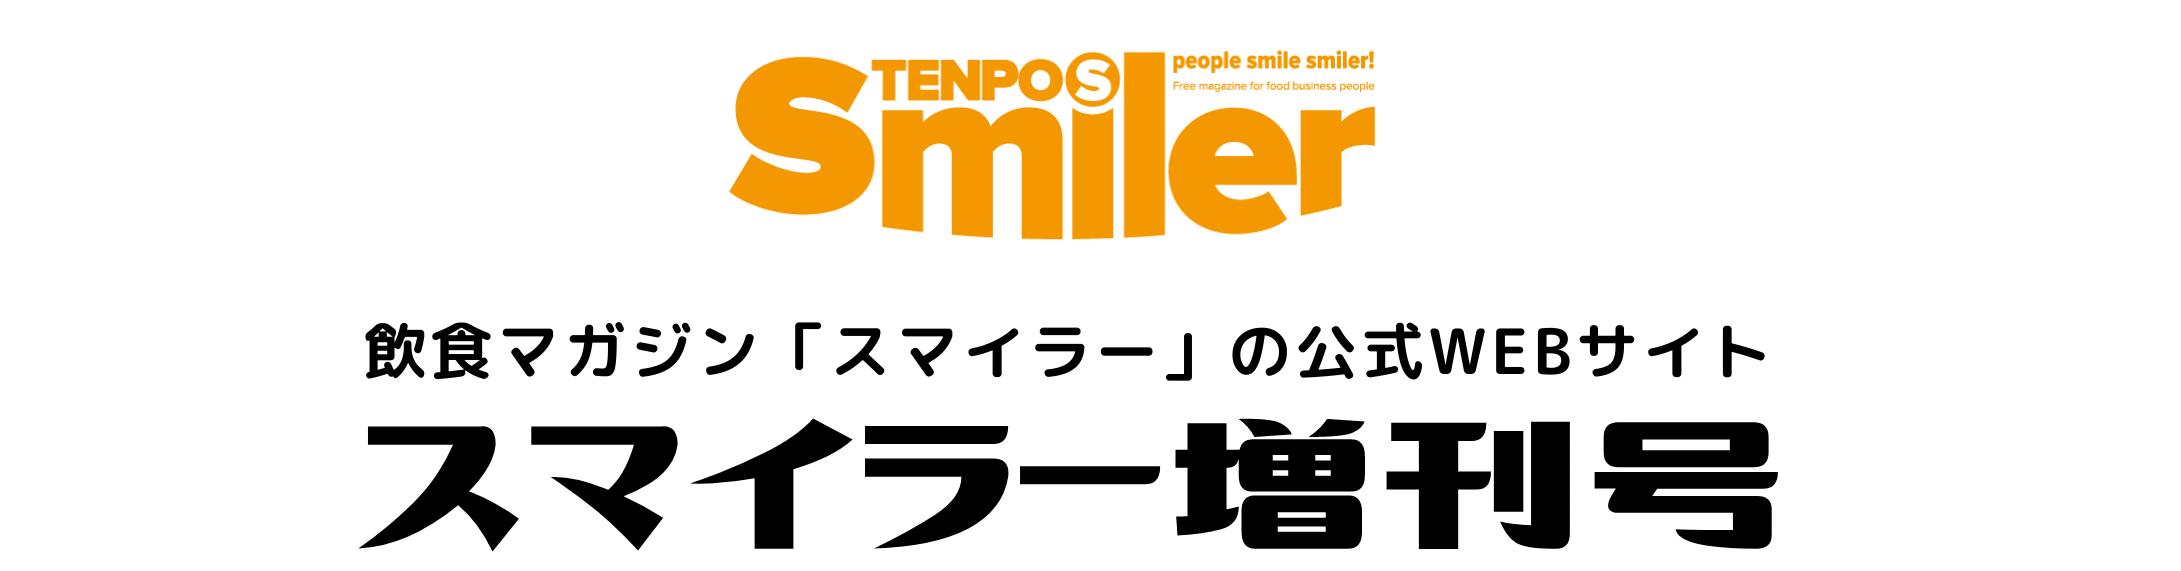 Smiler.jp